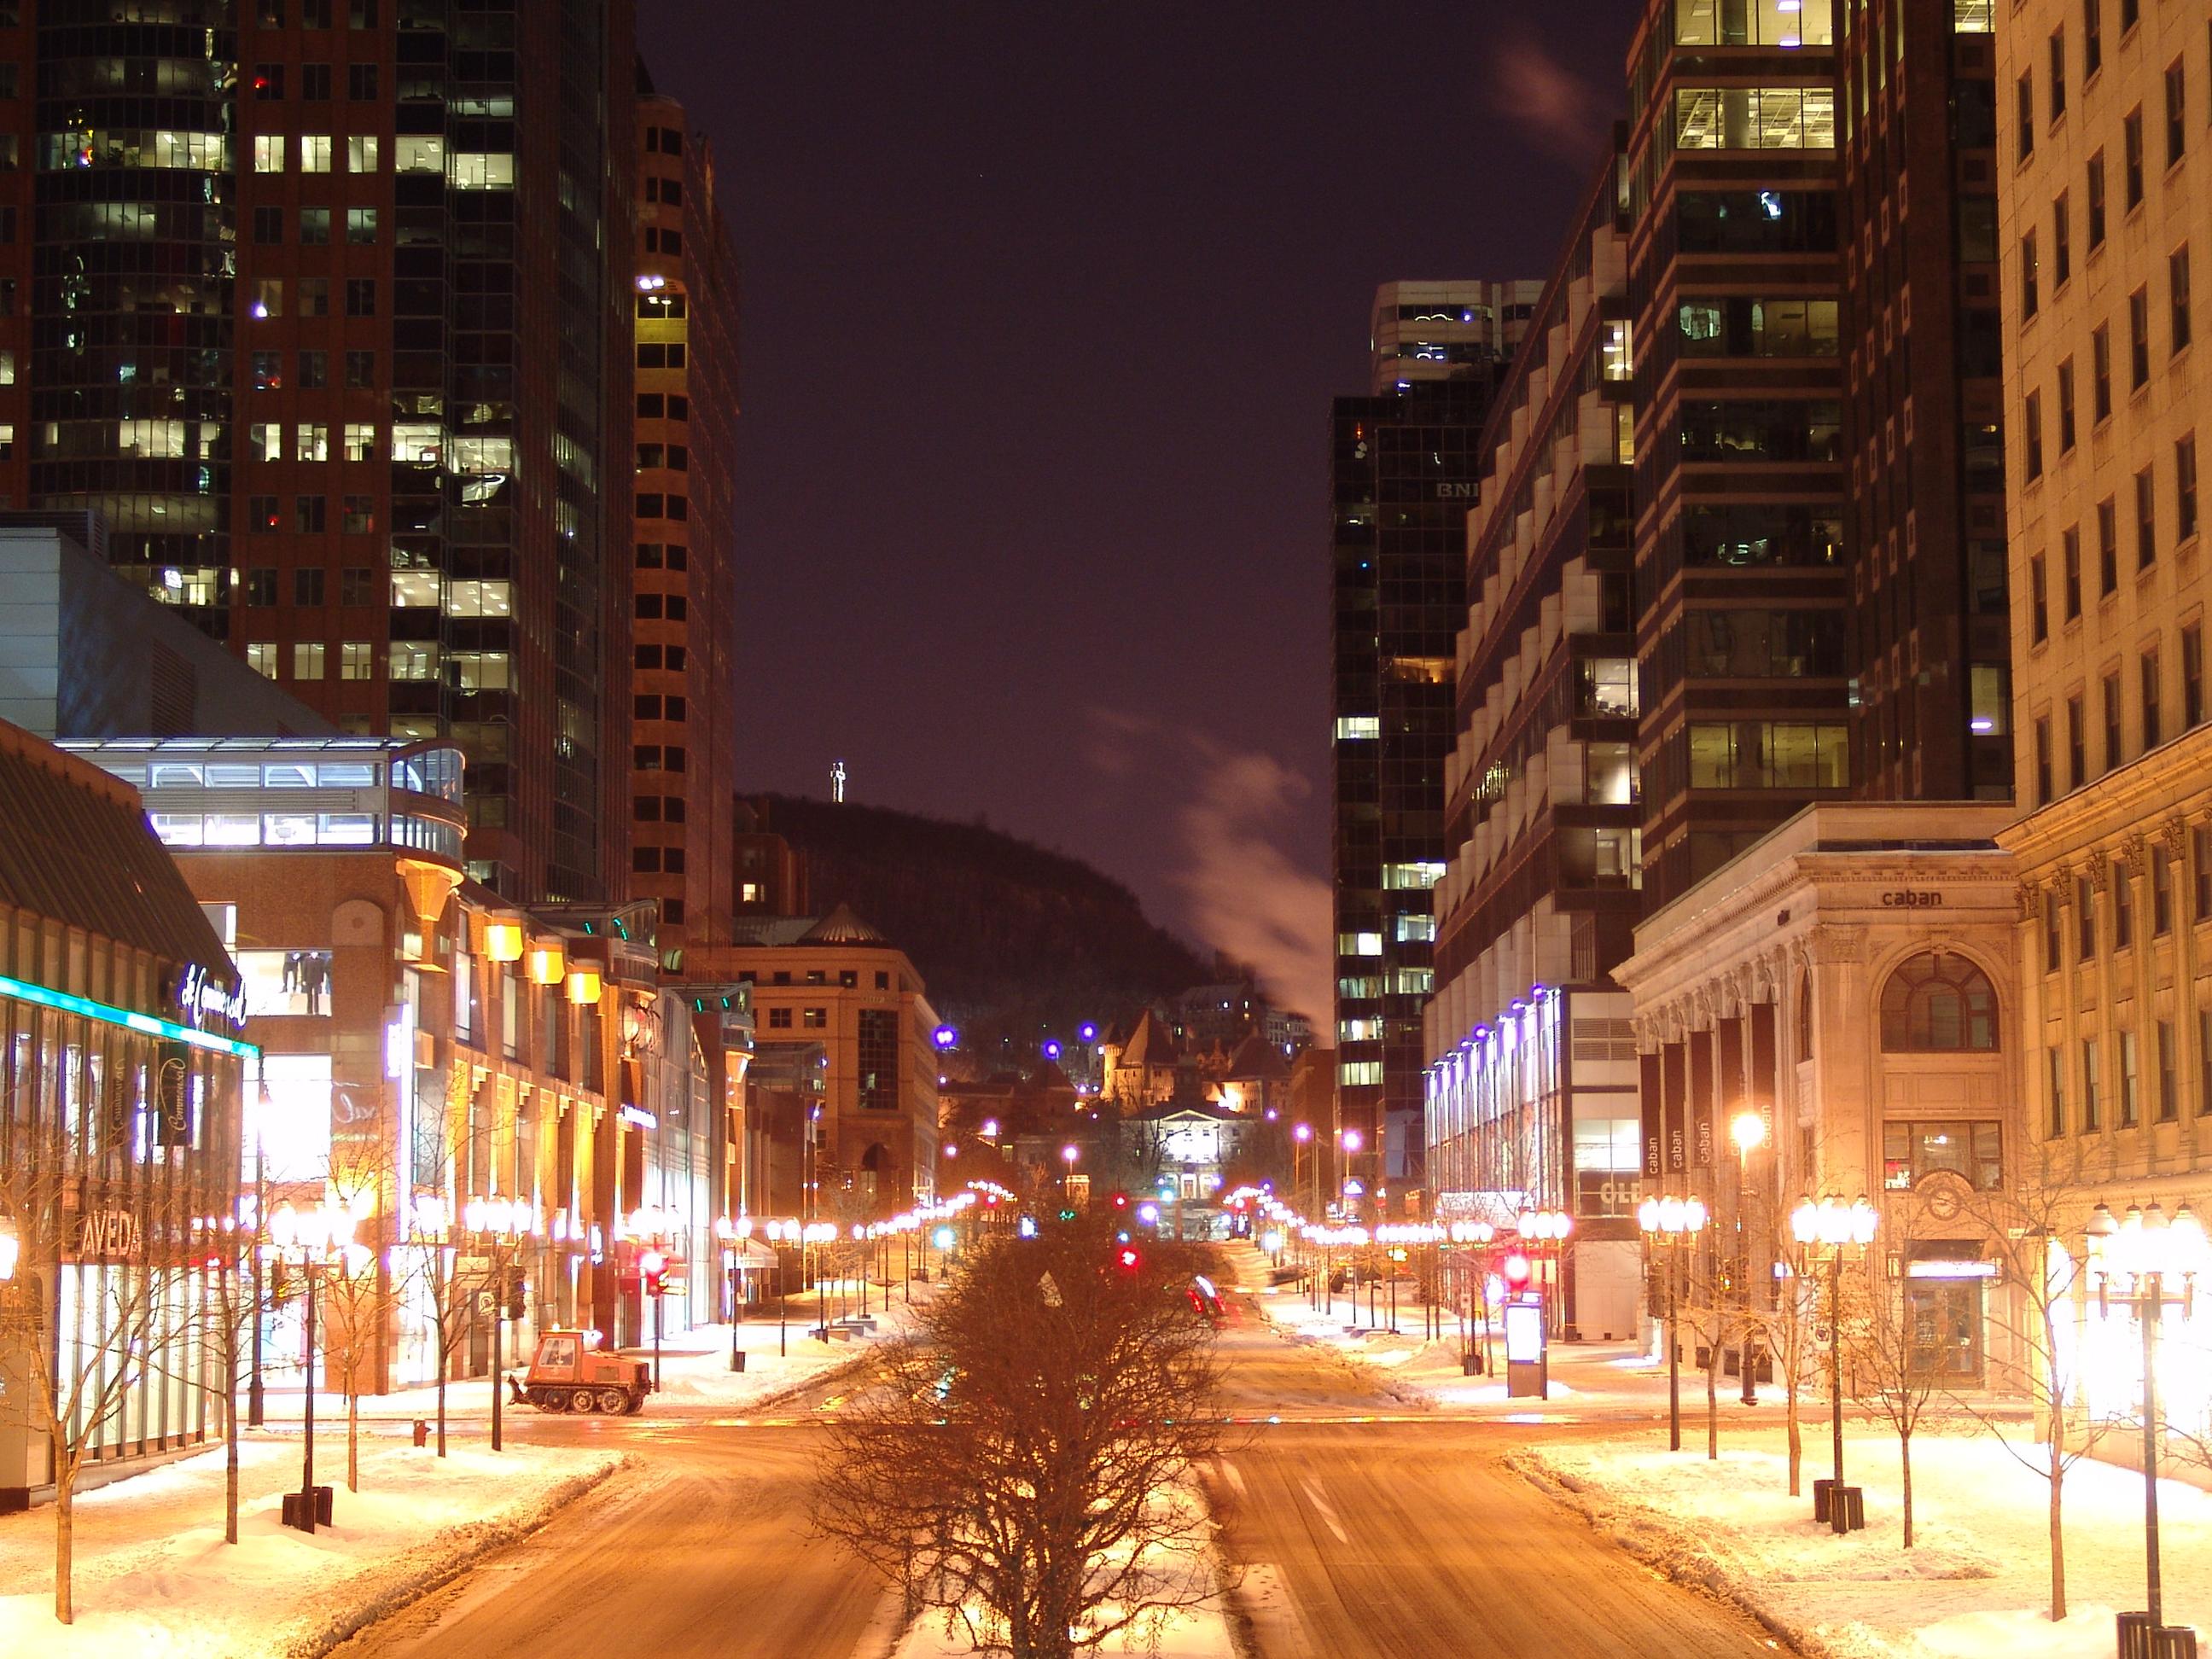 Mcgill College Avenue from below Saint-Catherine Street